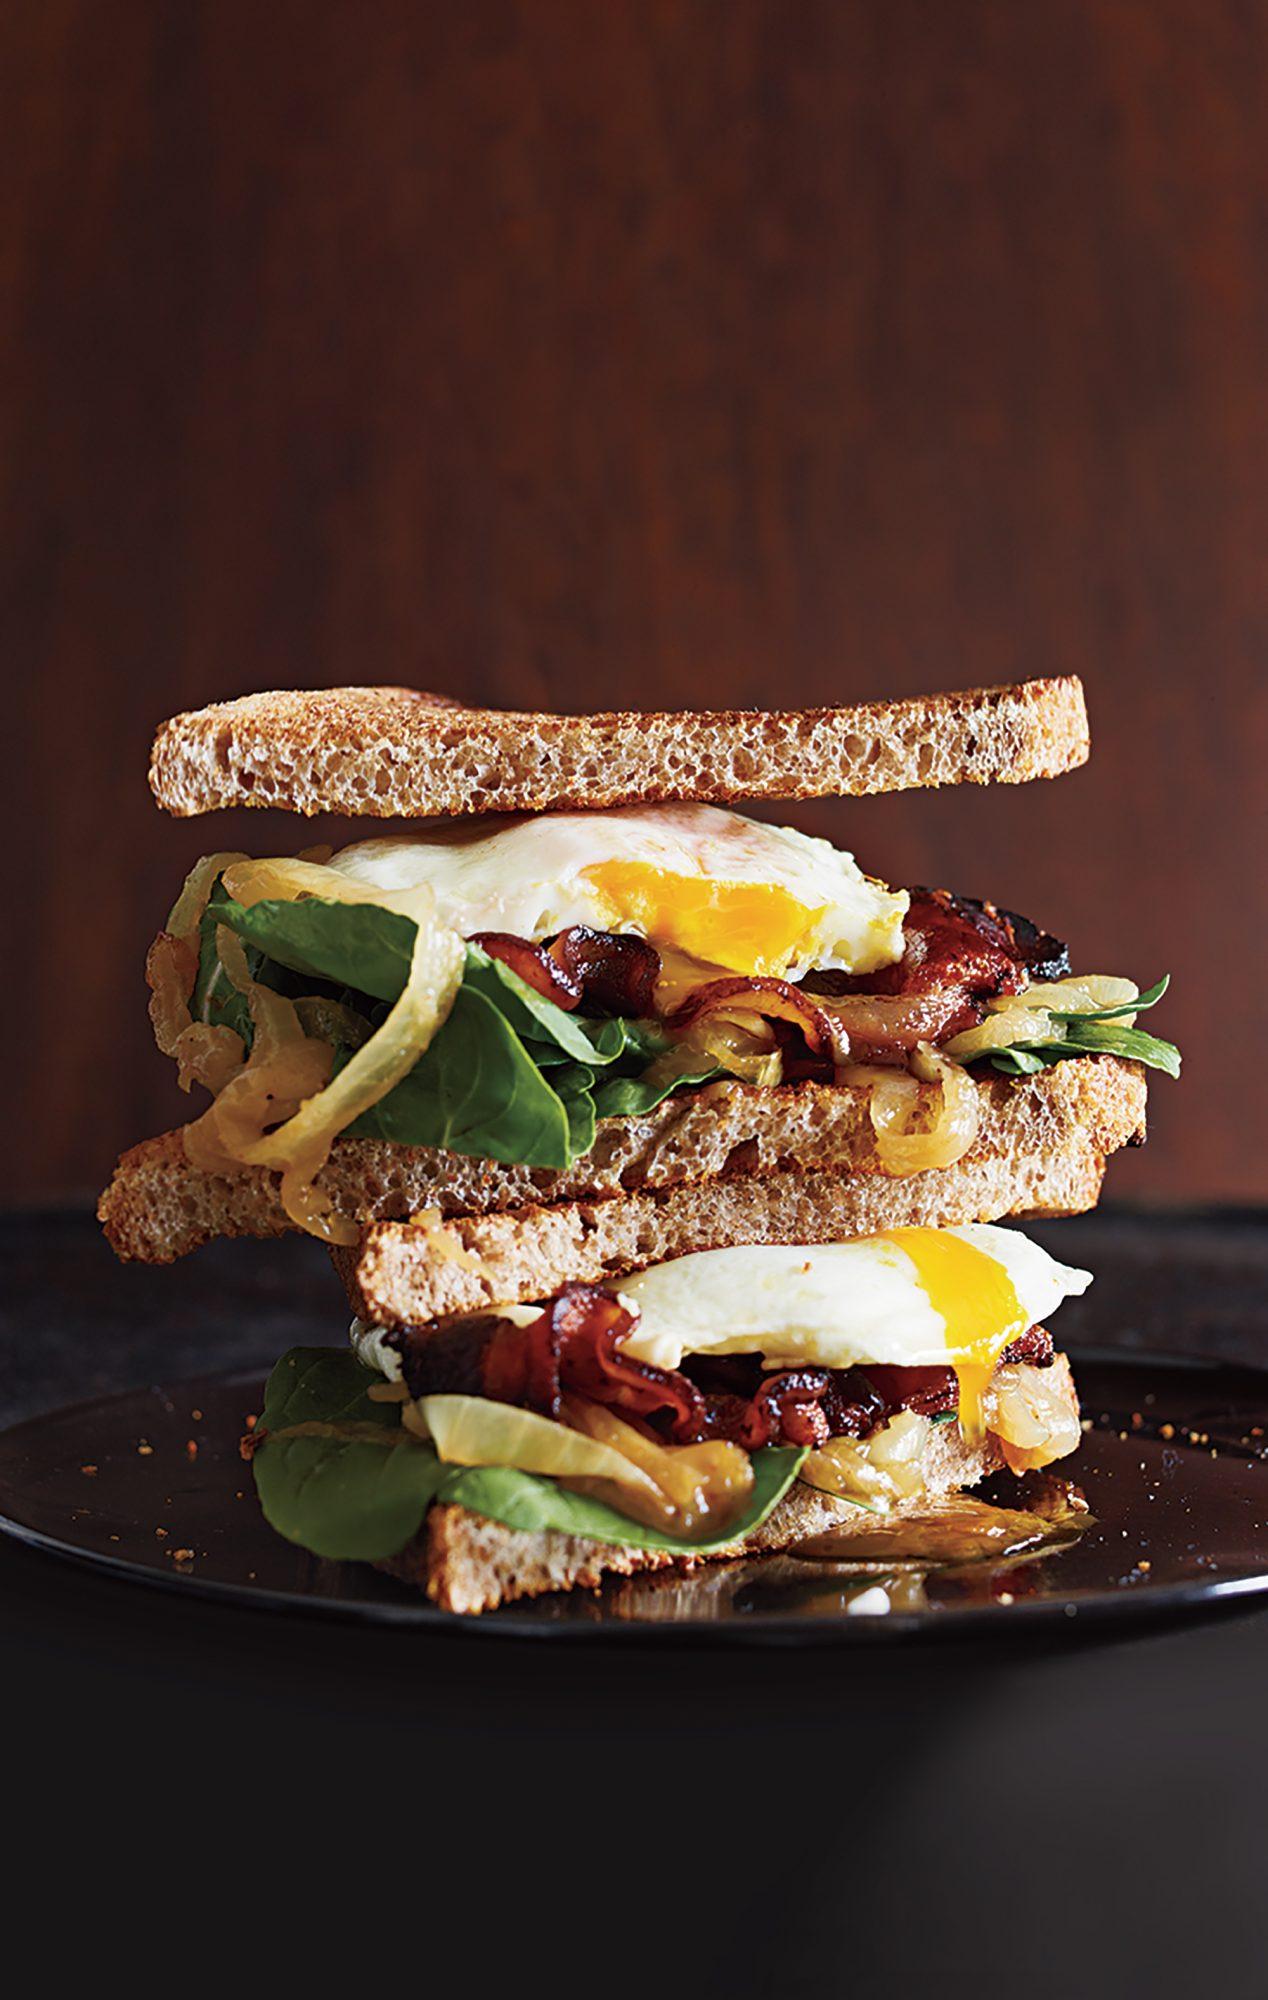 game-of-thrones-menu-egg-bacon-sandwich